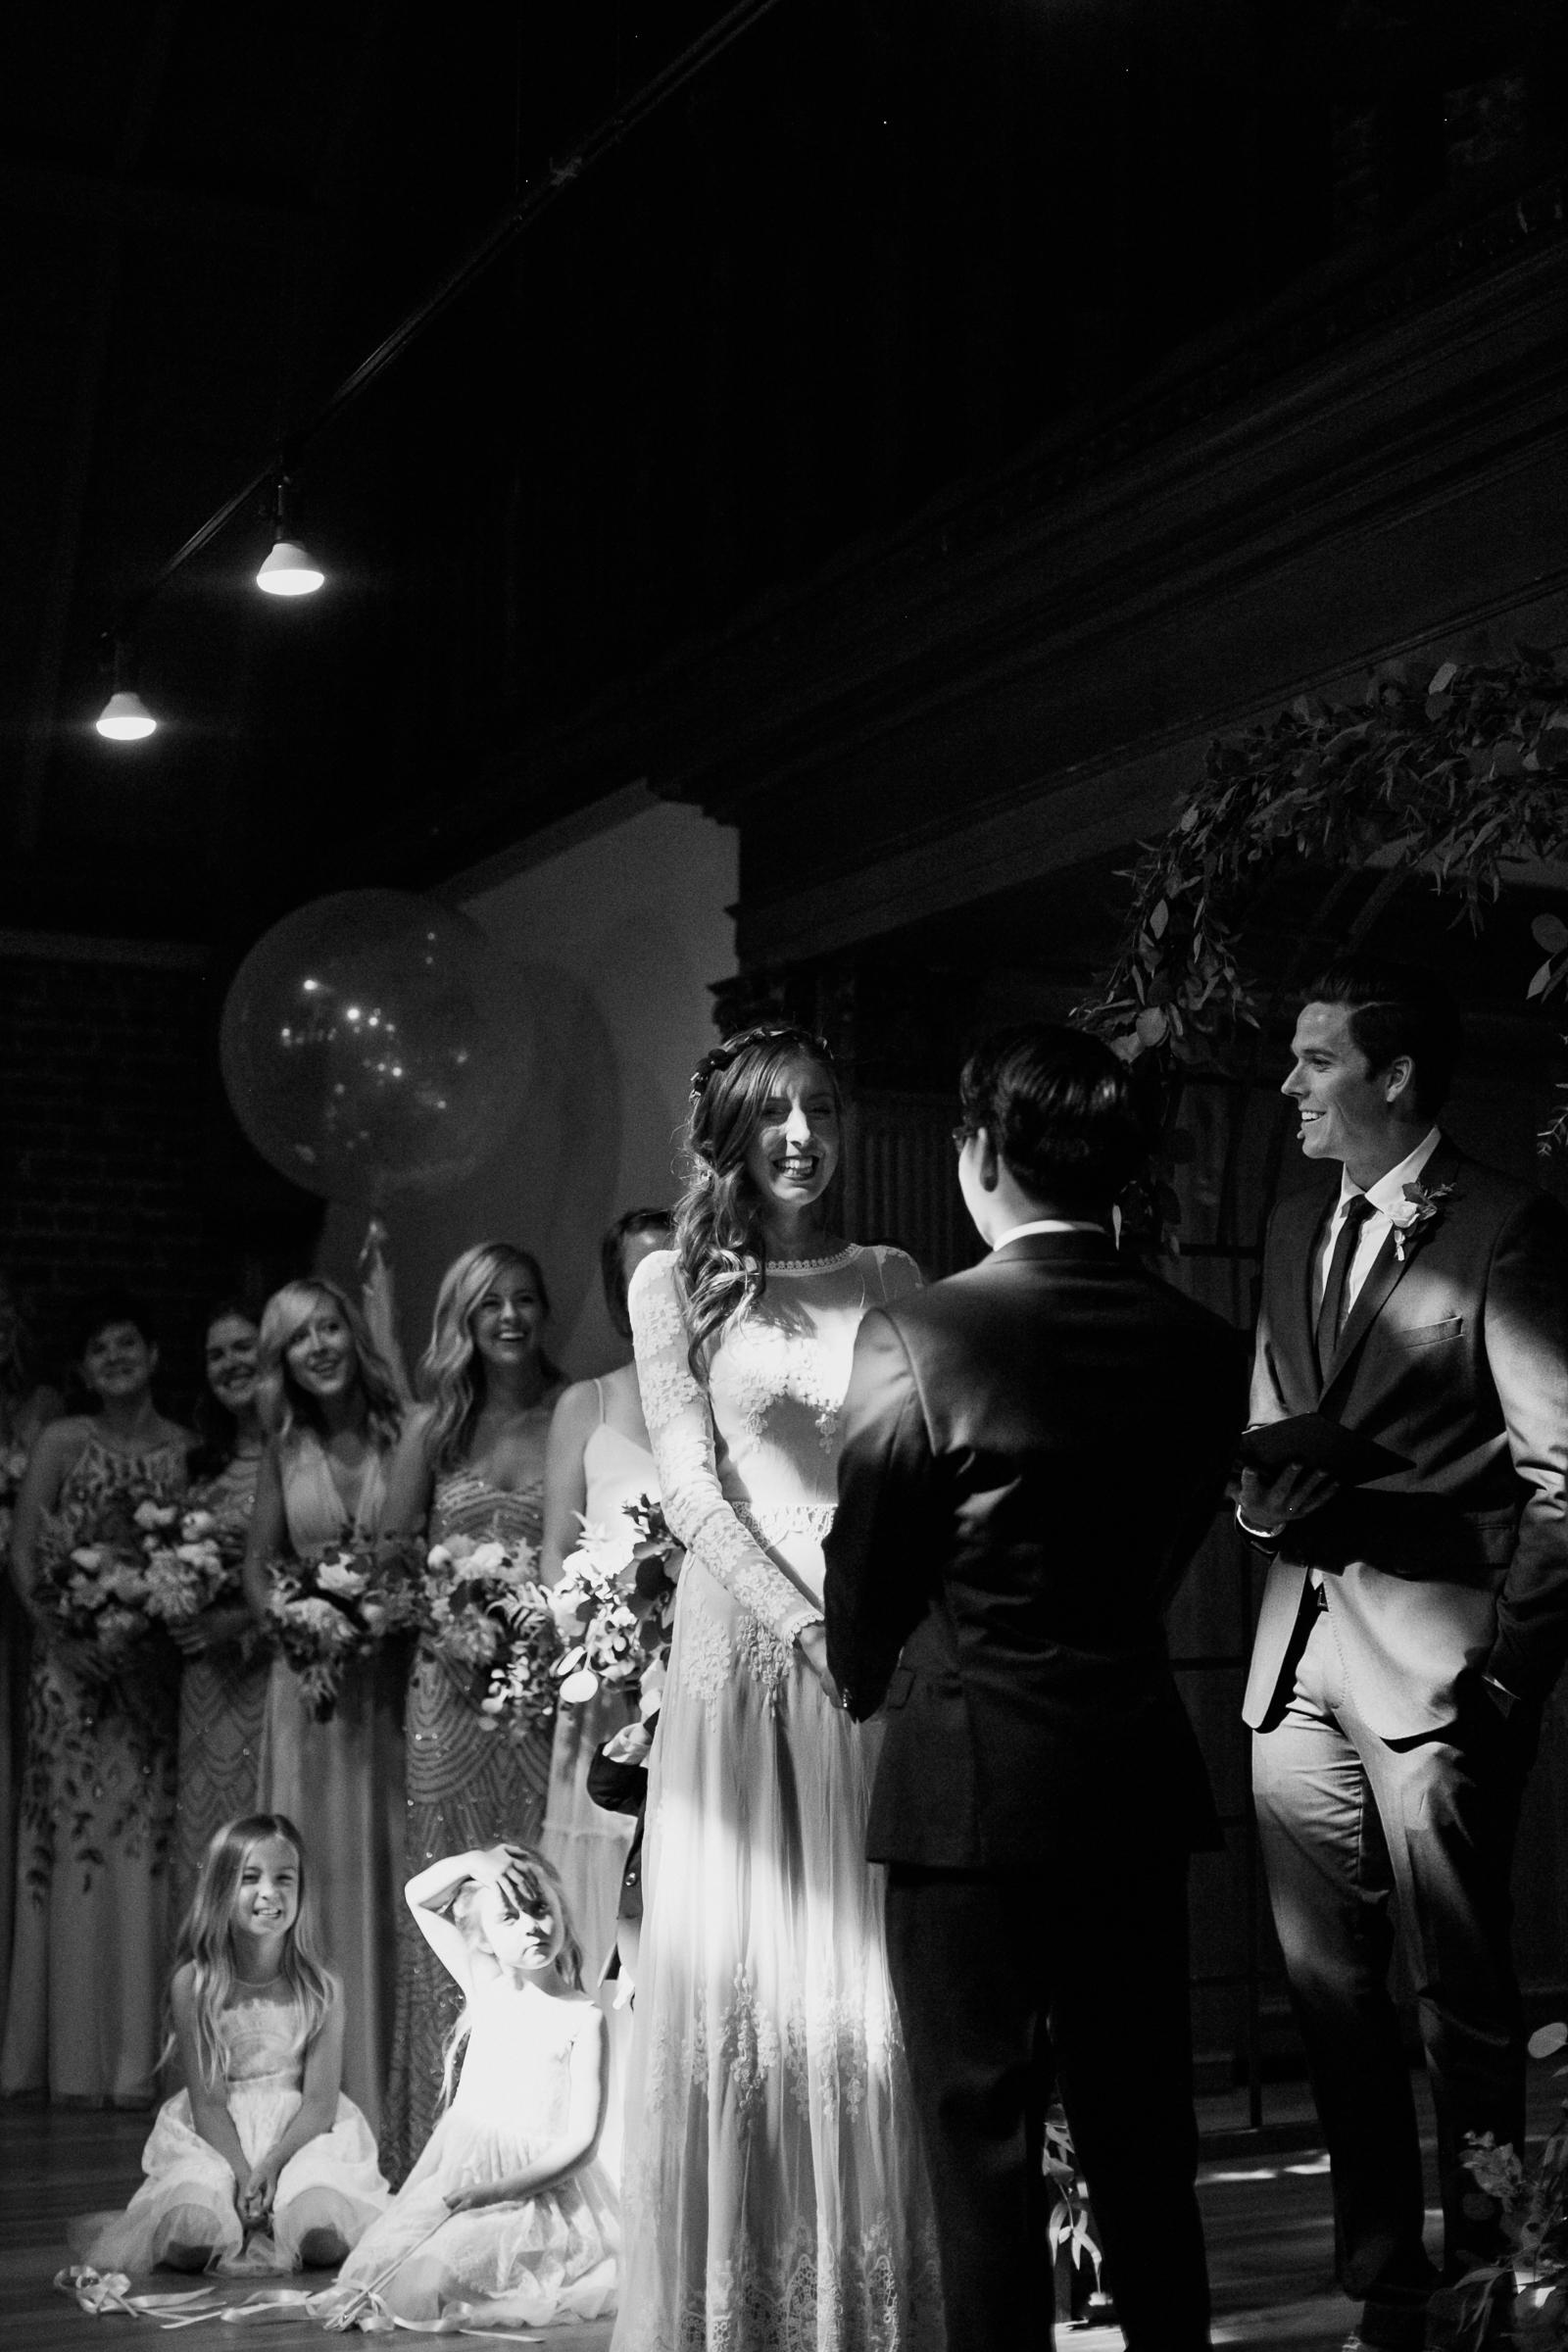 KWON_WEDDING_342.jpg